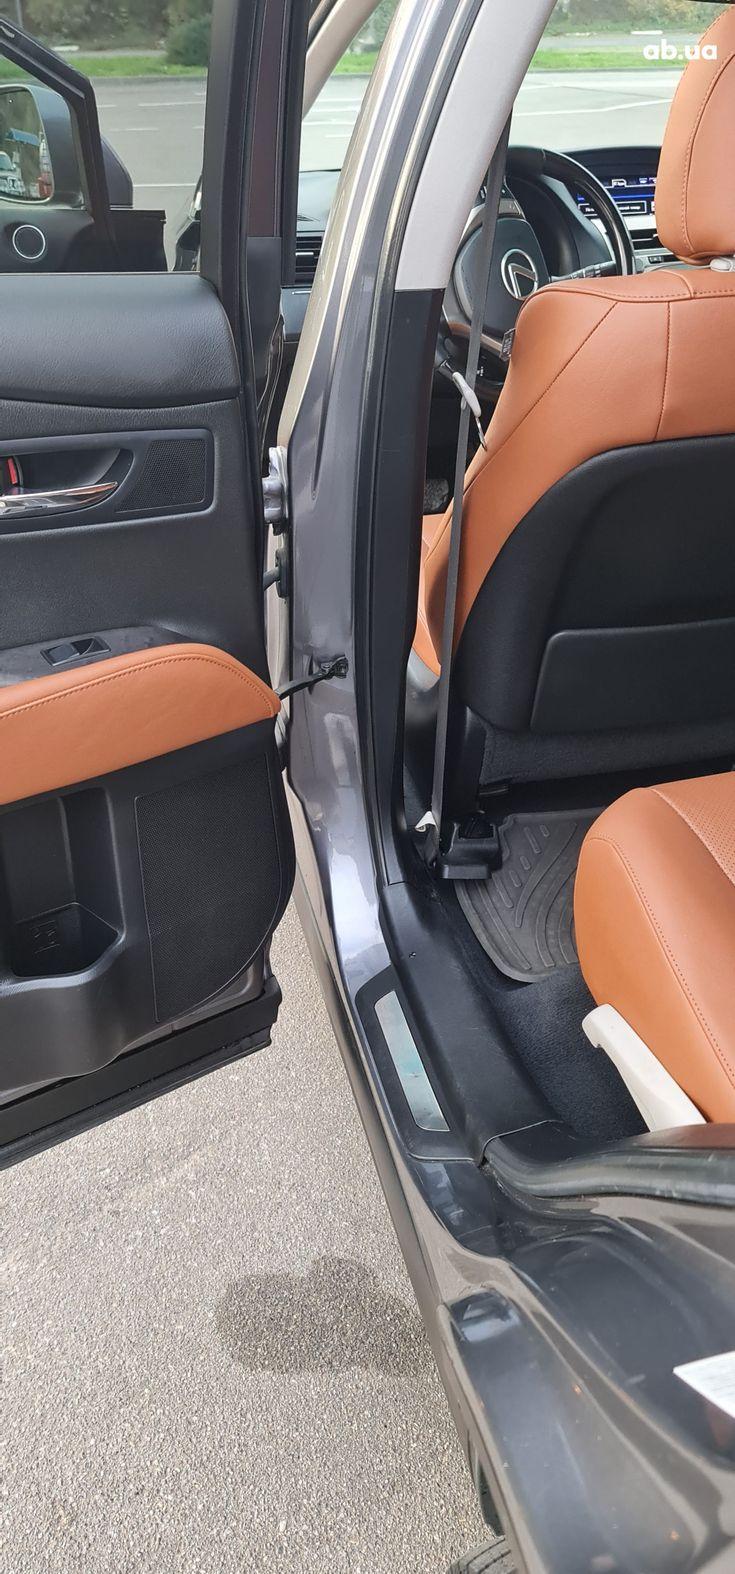 Lexus rx 350 2013 серый - фото 5